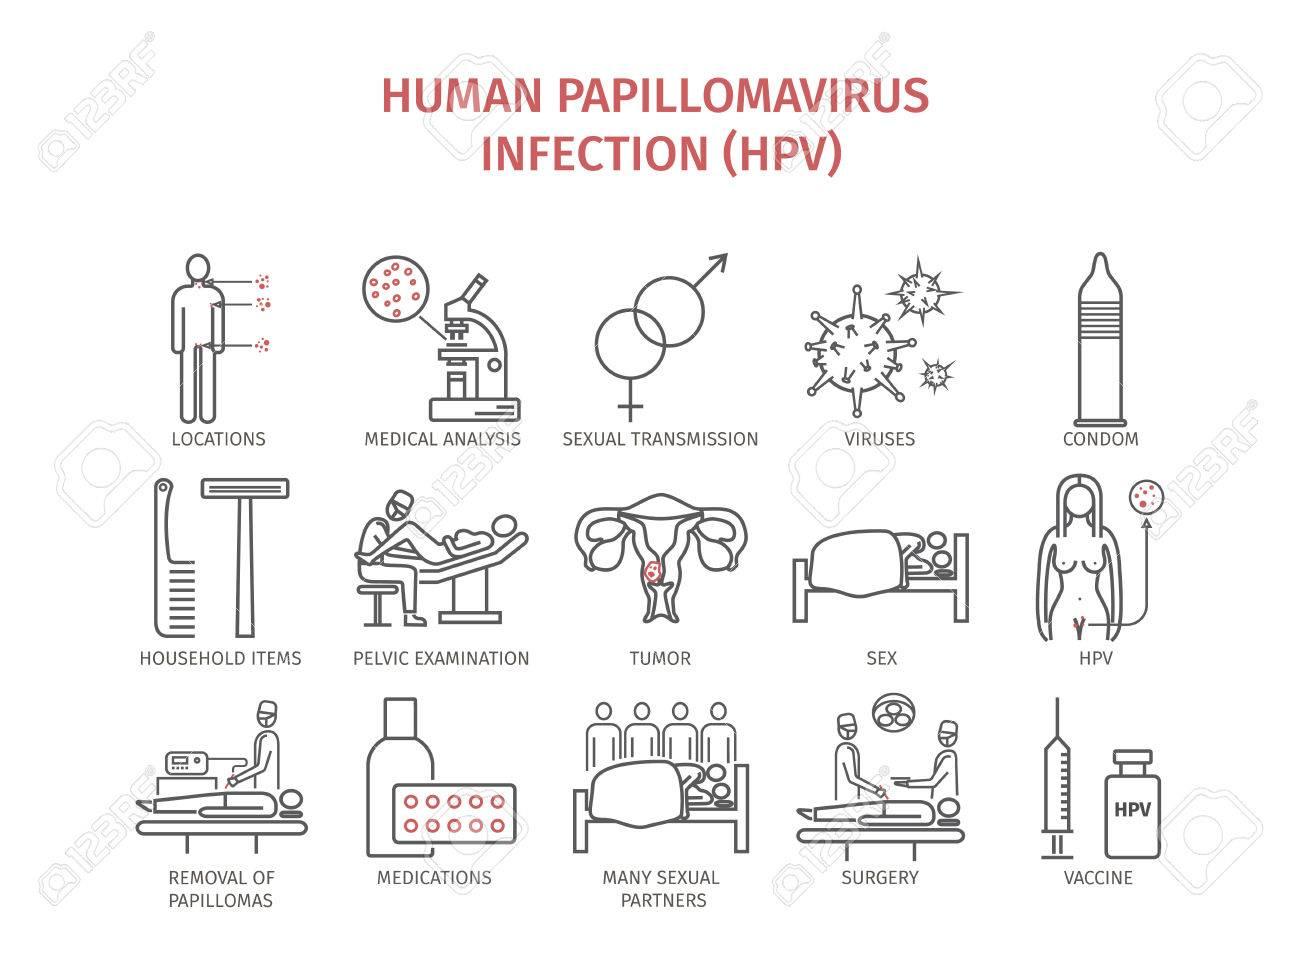 tratamiento infeccion virus papiloma humano papilloma intraduttale sangue